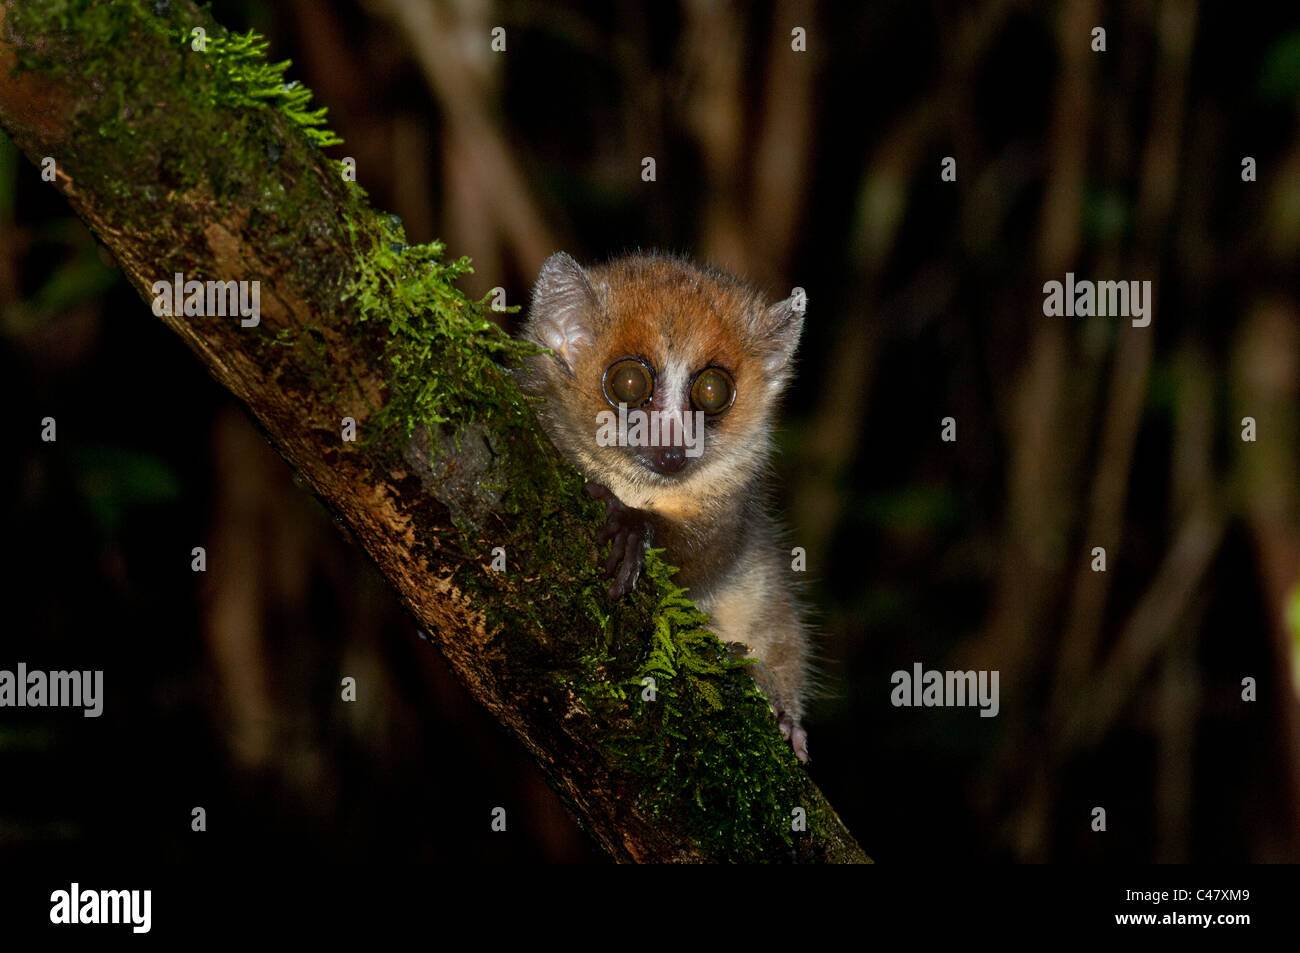 smallest lemur maki mouse mousemaki wildlife small big eye Kirindy Ranomafana Madagascar madagaskar wild forest - Stock Image